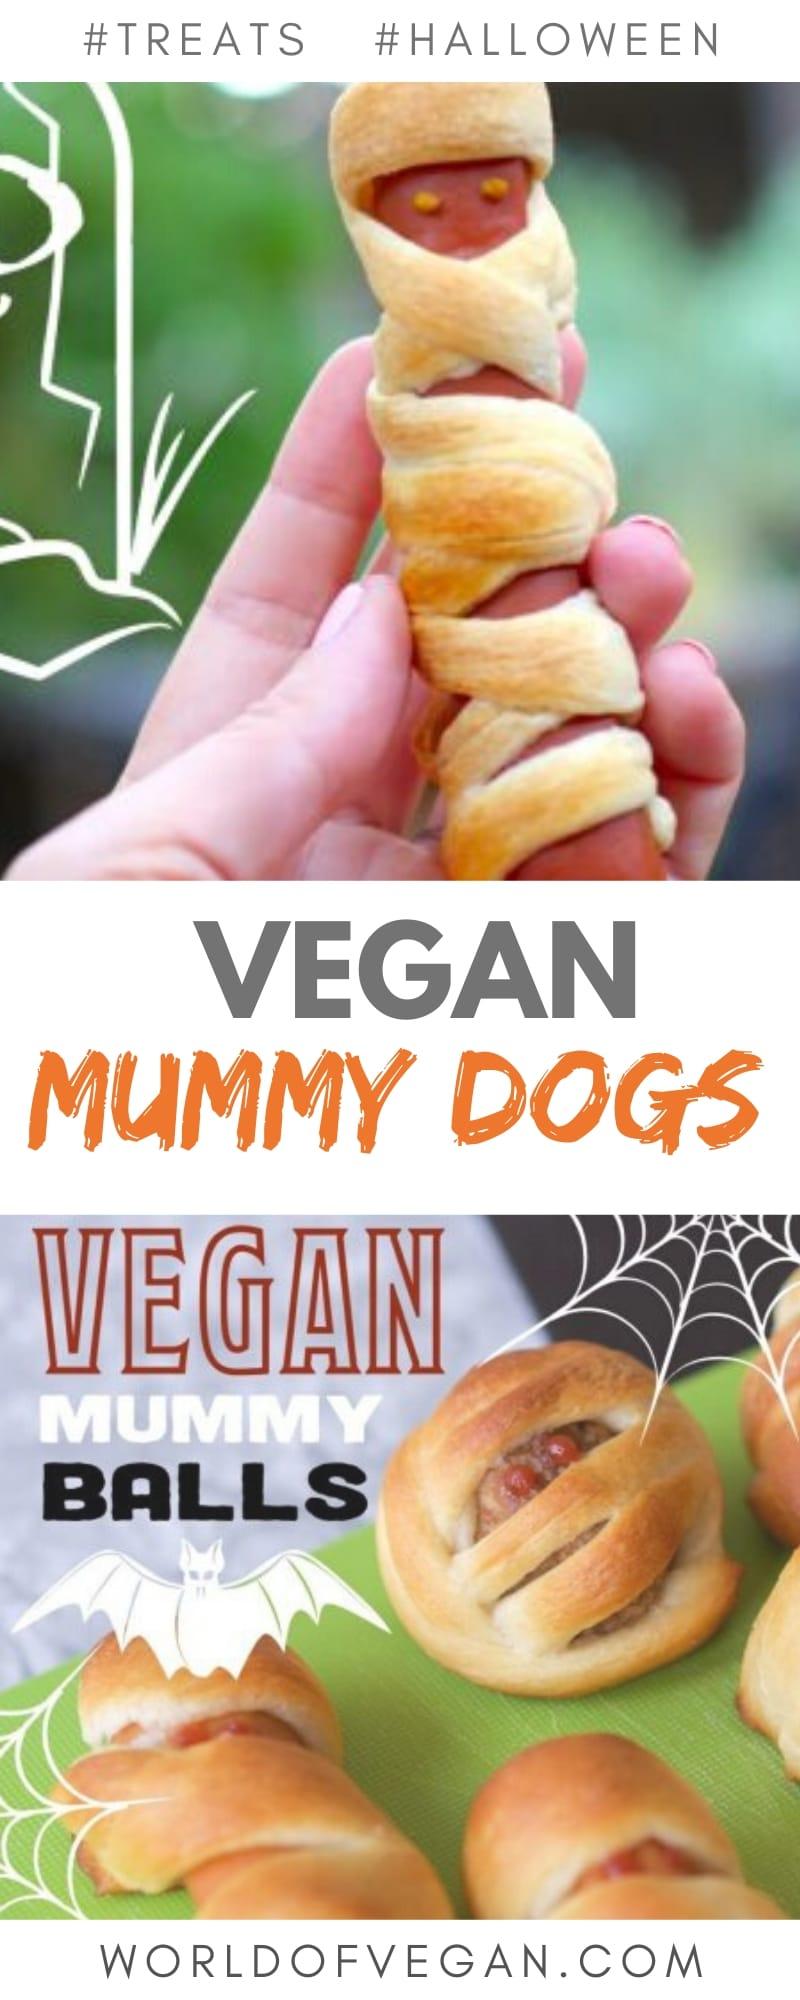 Vegan Mummy Dogs   Halloween Treats   World of Vegan   #vegan #treats #halloween #recipe #sausages #meatballs #worldofvegan